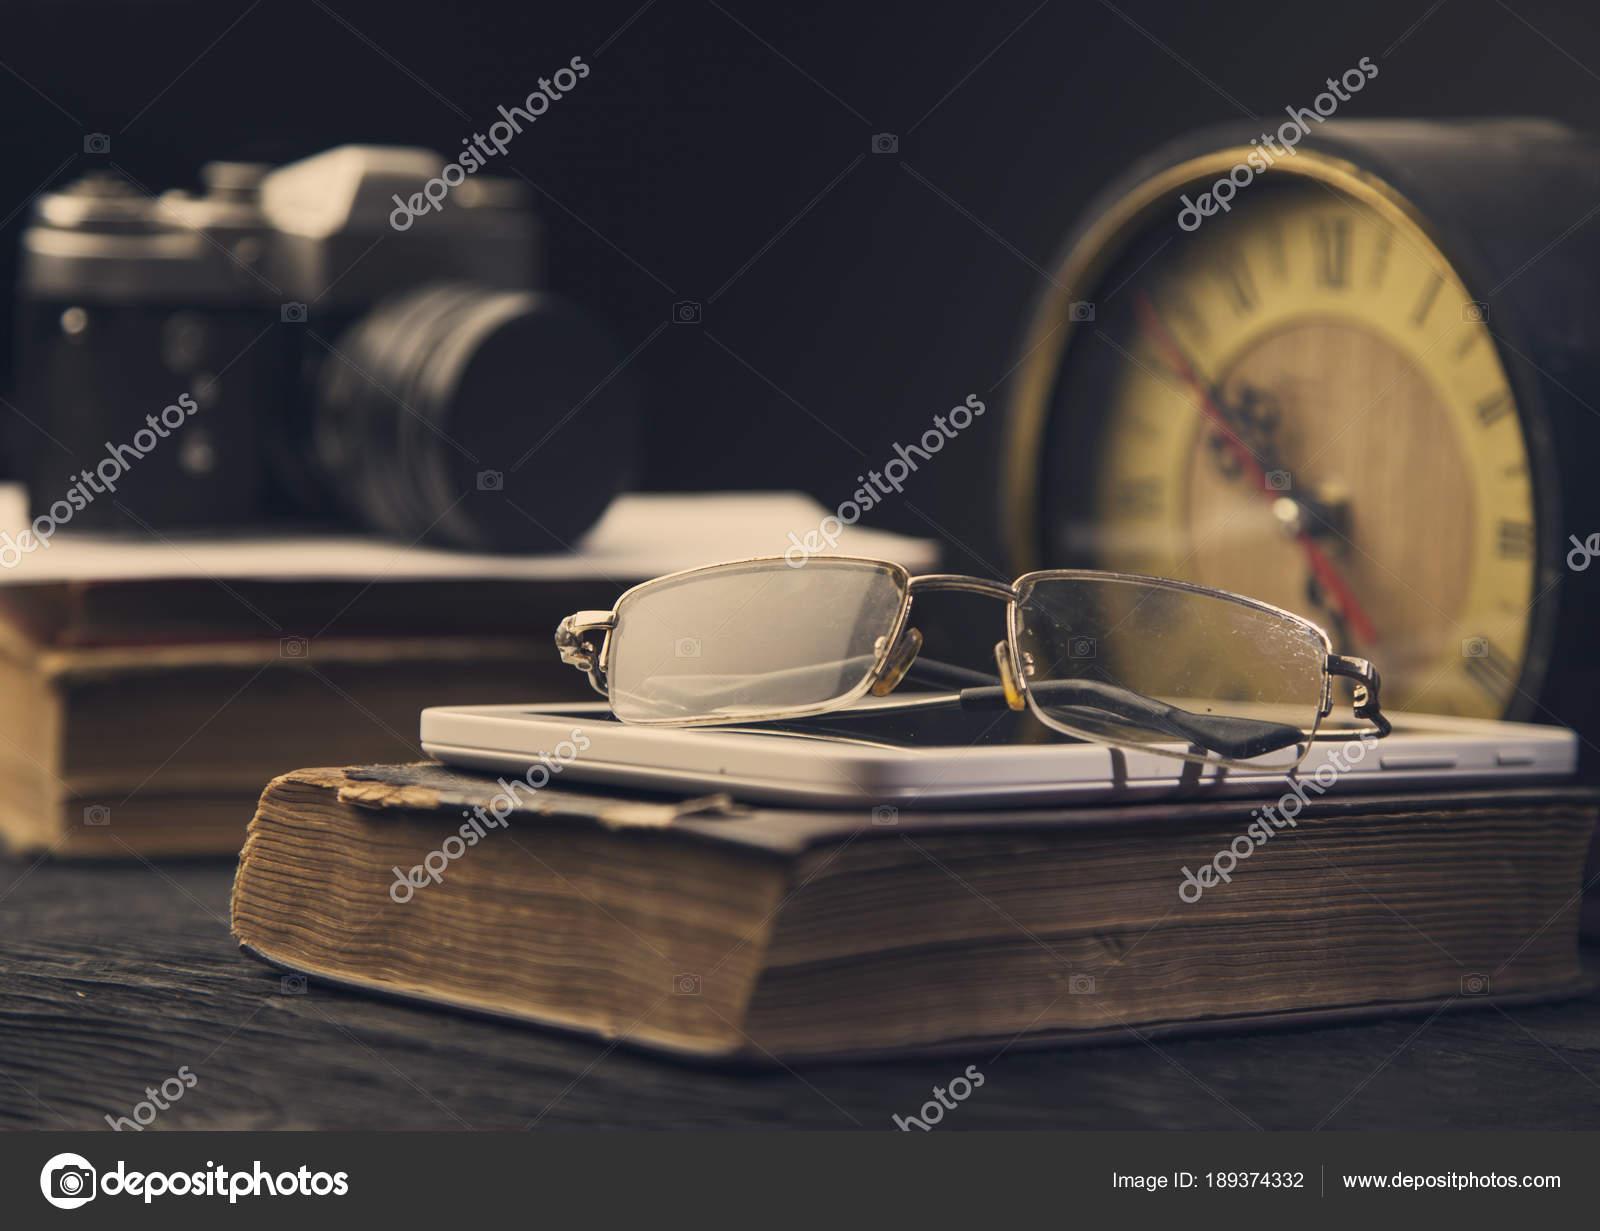 41050570da Κάμερα ρολόι παλιό βιβλίο tablet και γυαλιά οράσεως τόνωση φωτογραφία–  εικόνα αρχείου